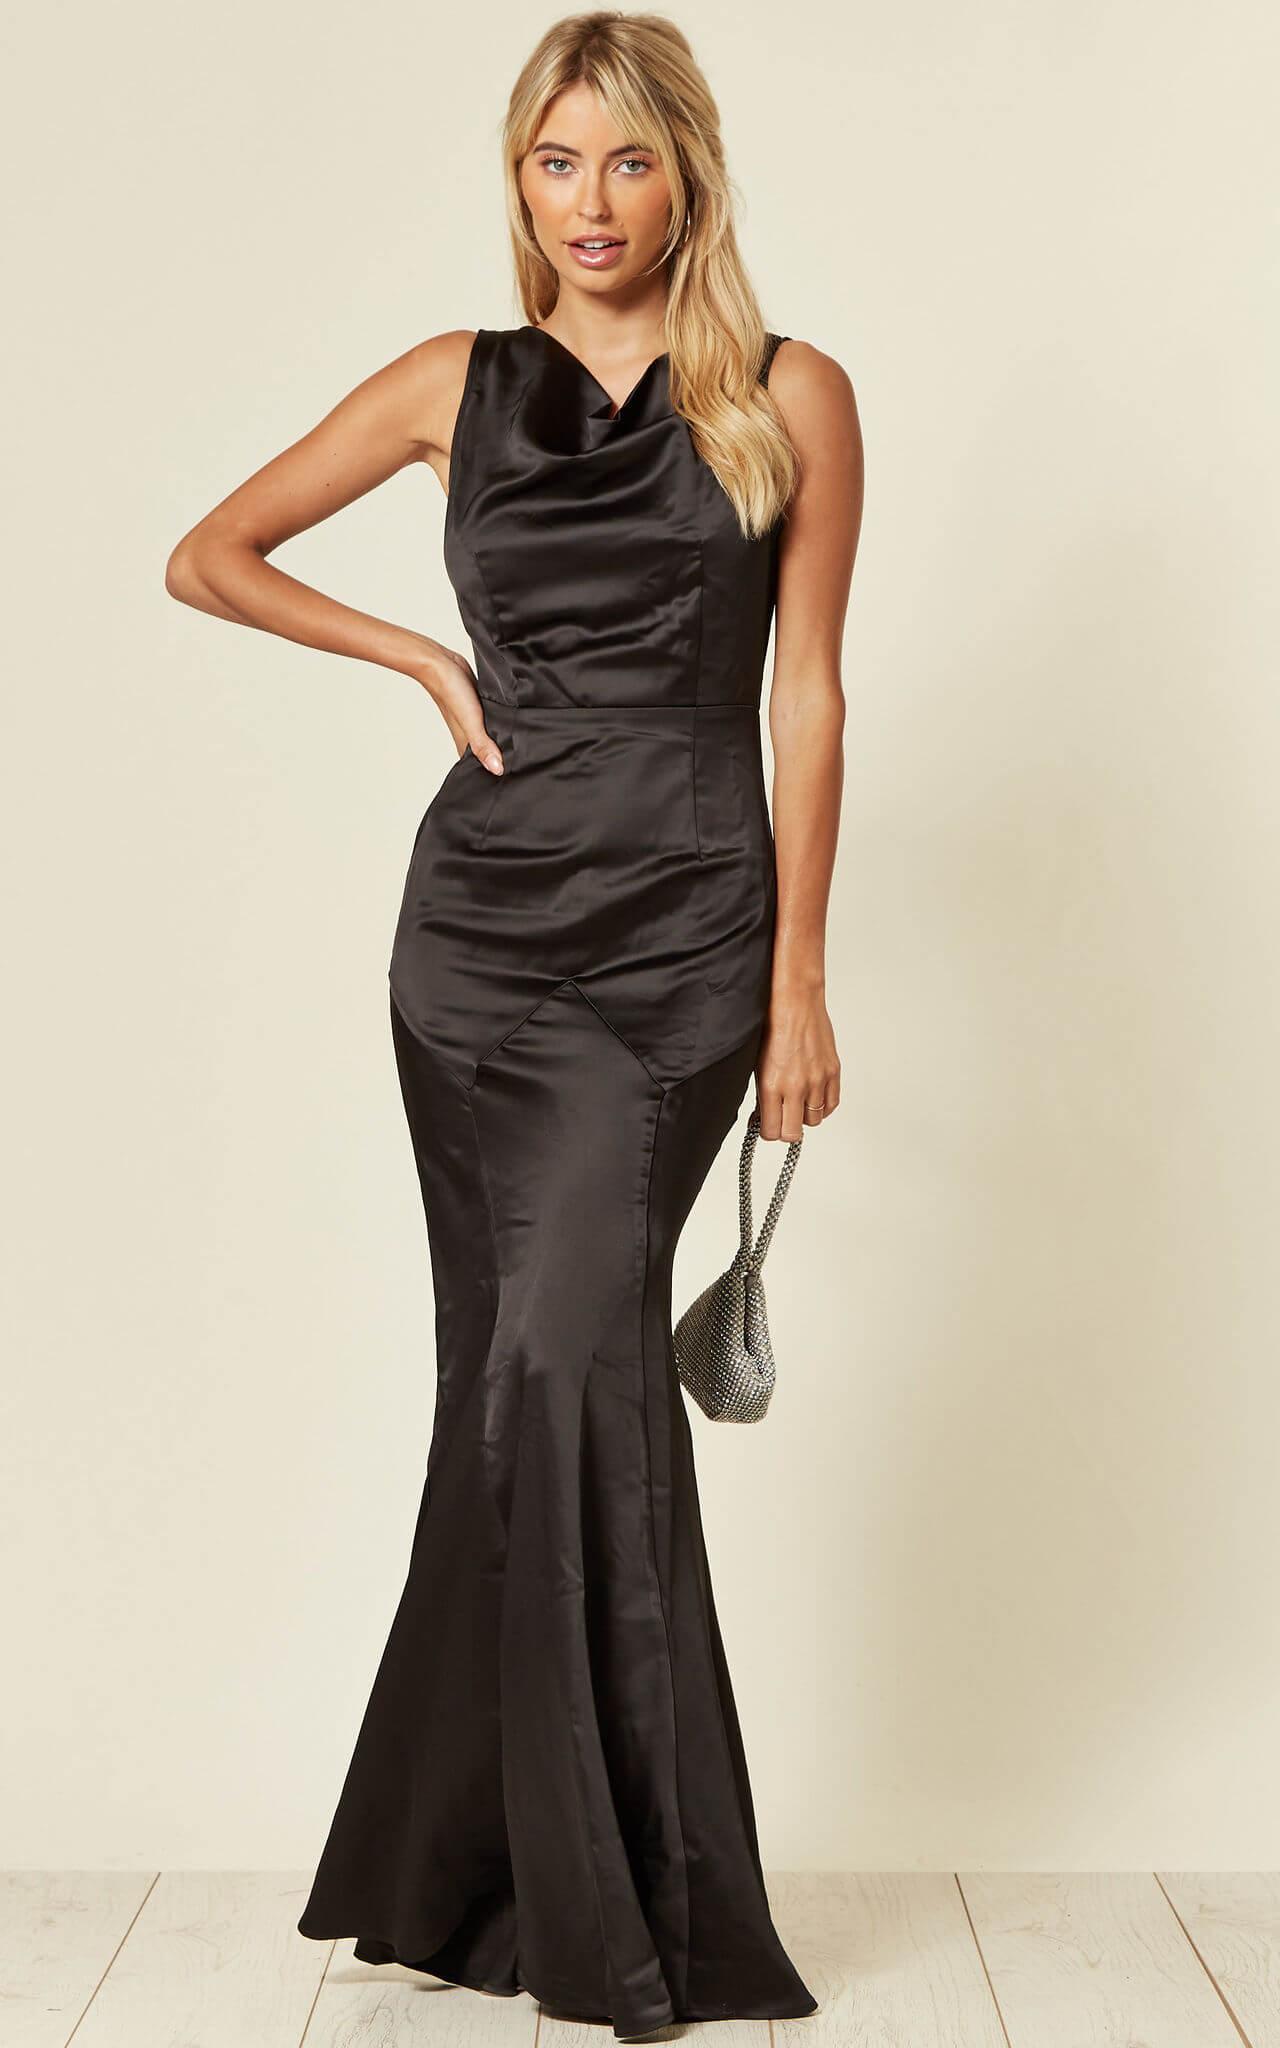 Model wears a fishtail prom evening black dress